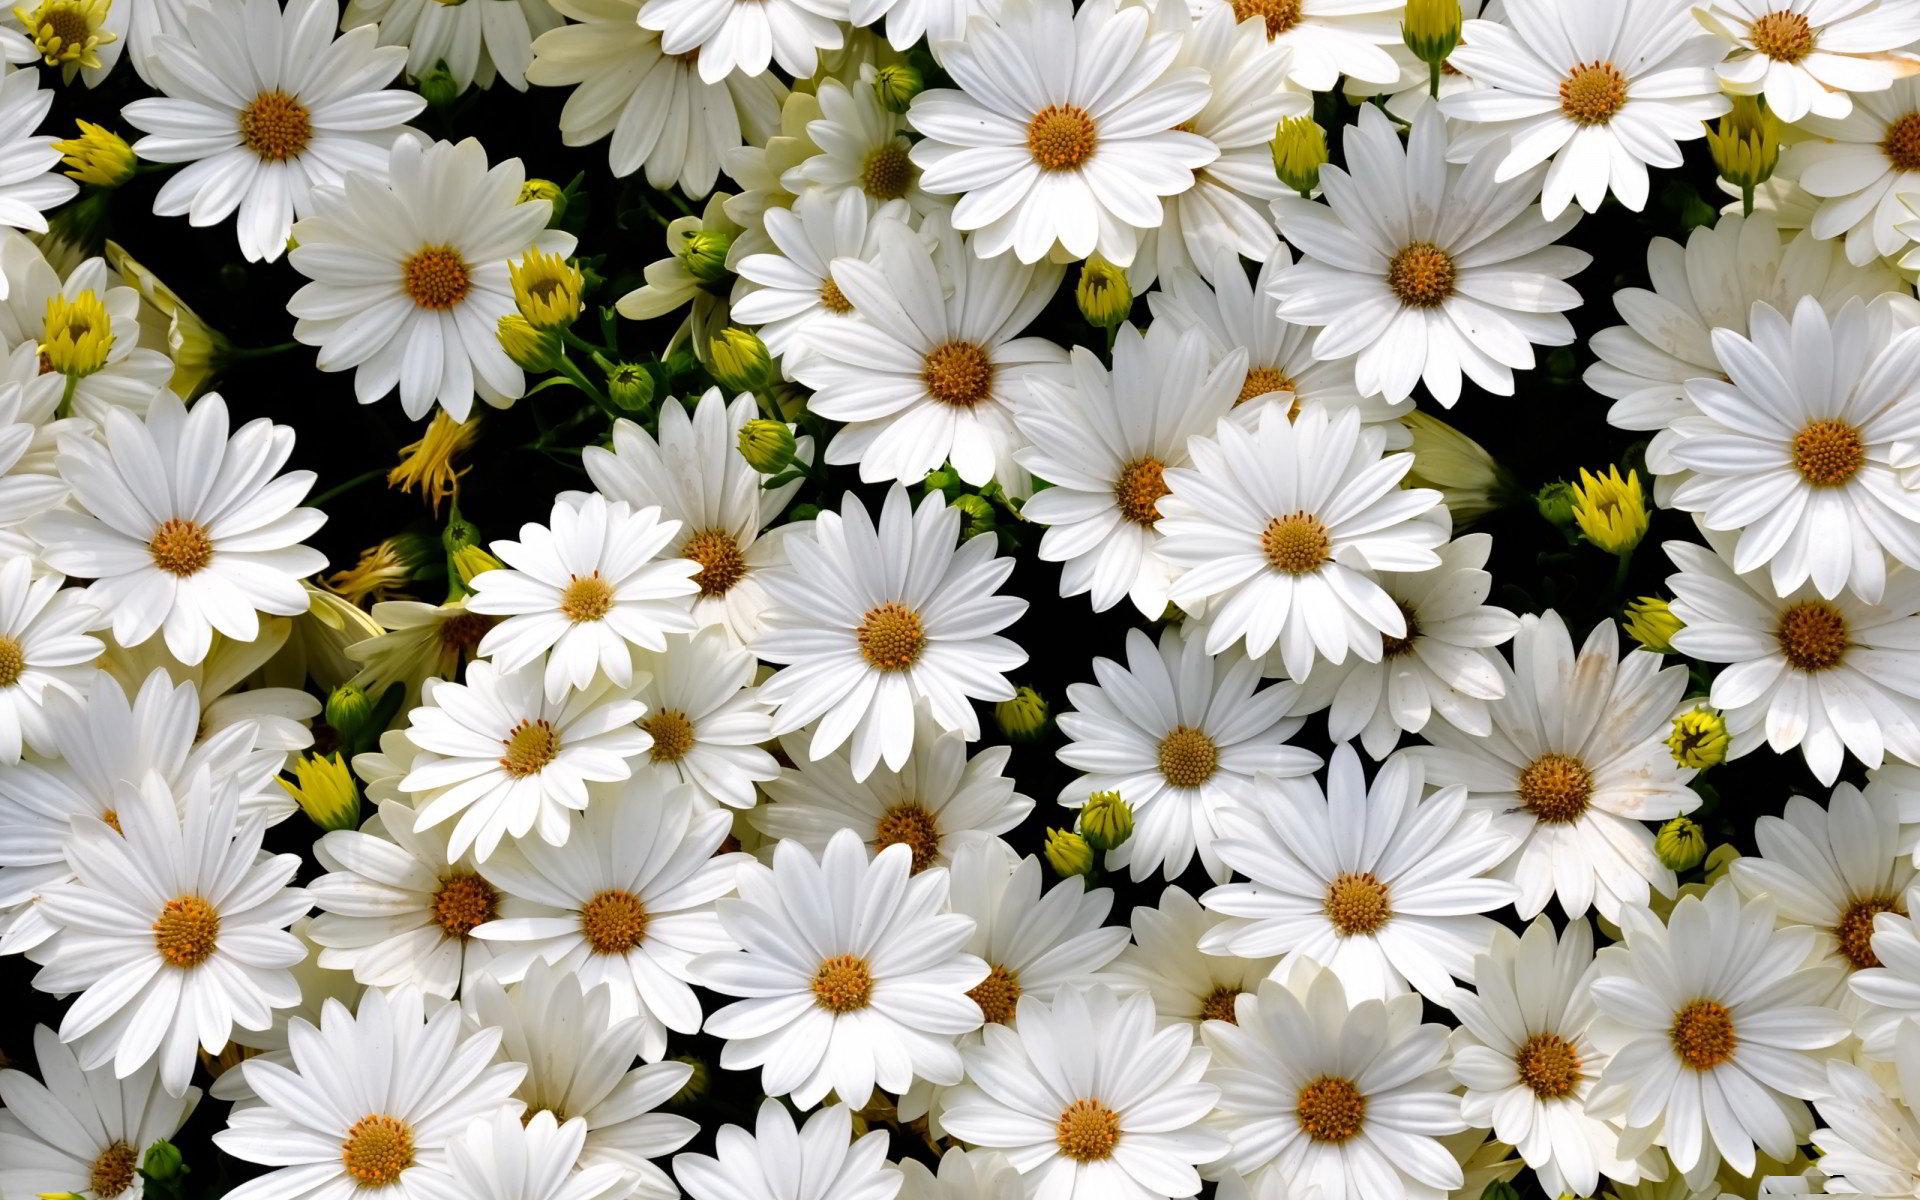 hinh anh hoa cuc dep 19